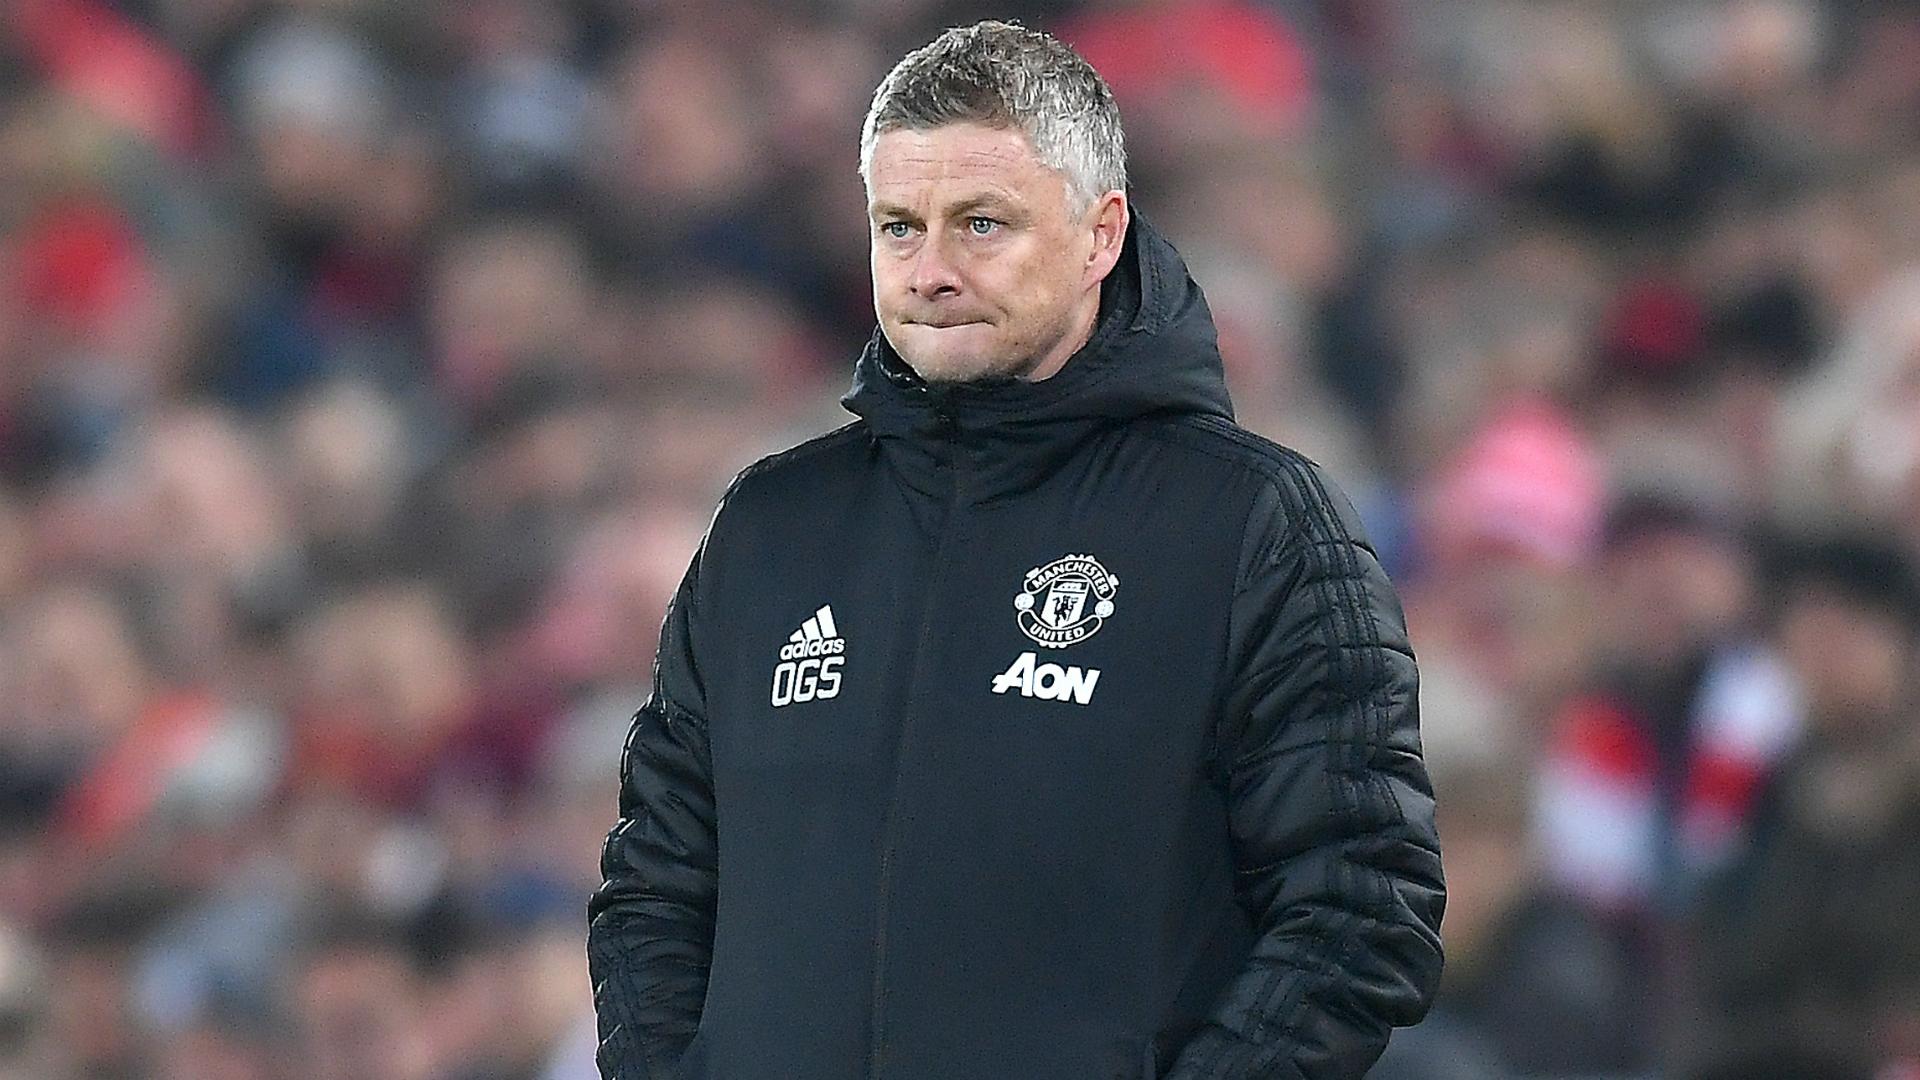 Solskjaer not fearing for job amid Man Utd struggles